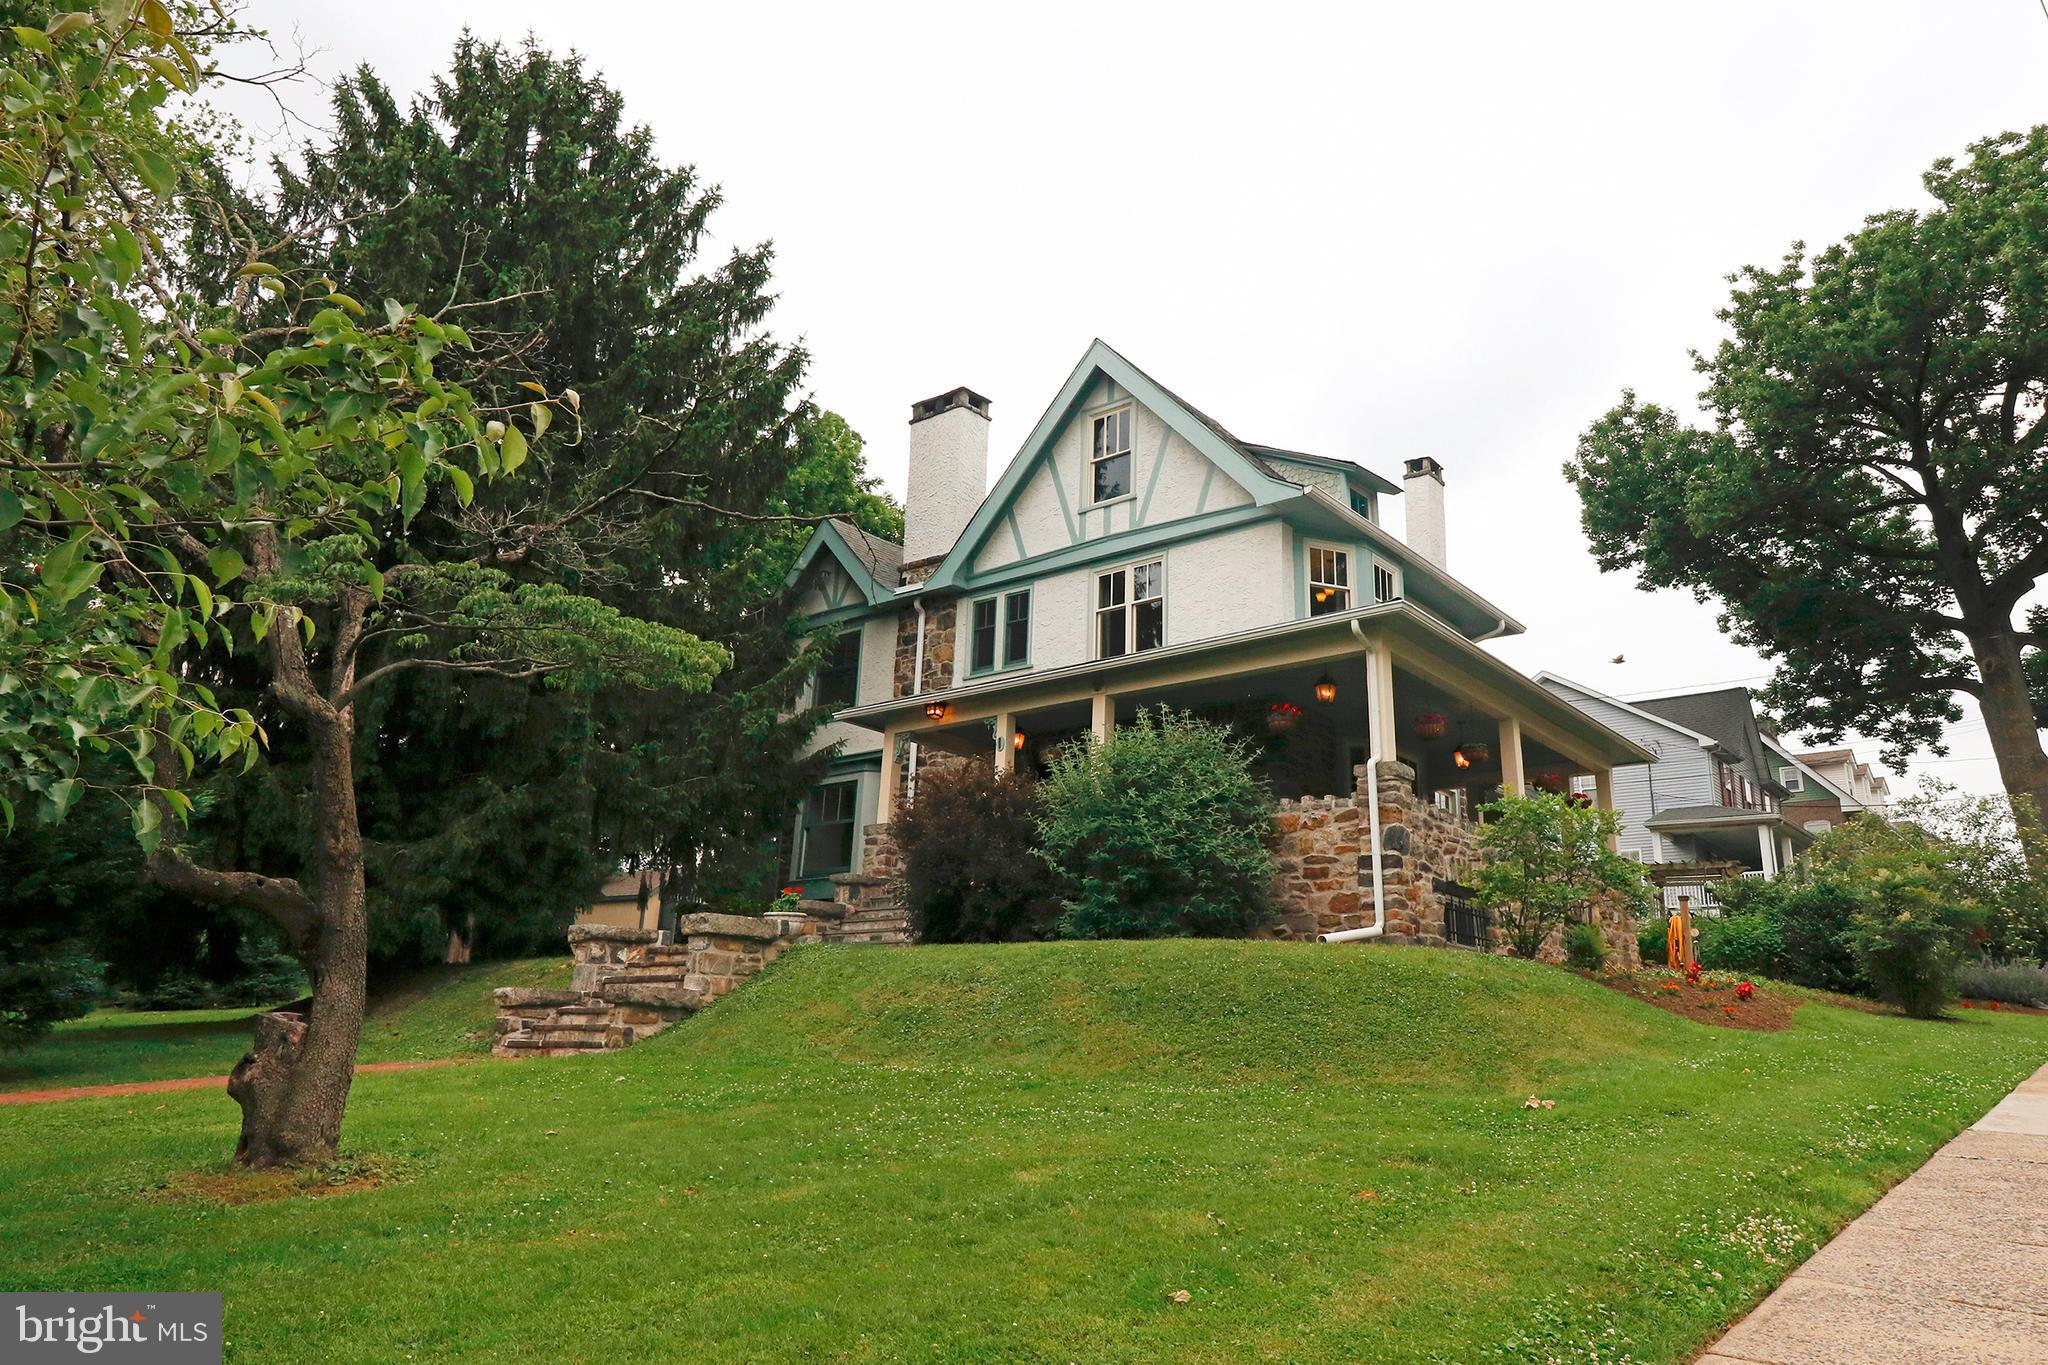 337 W RIDLEY AVENUE, RIDLEY PARK, PA 19078